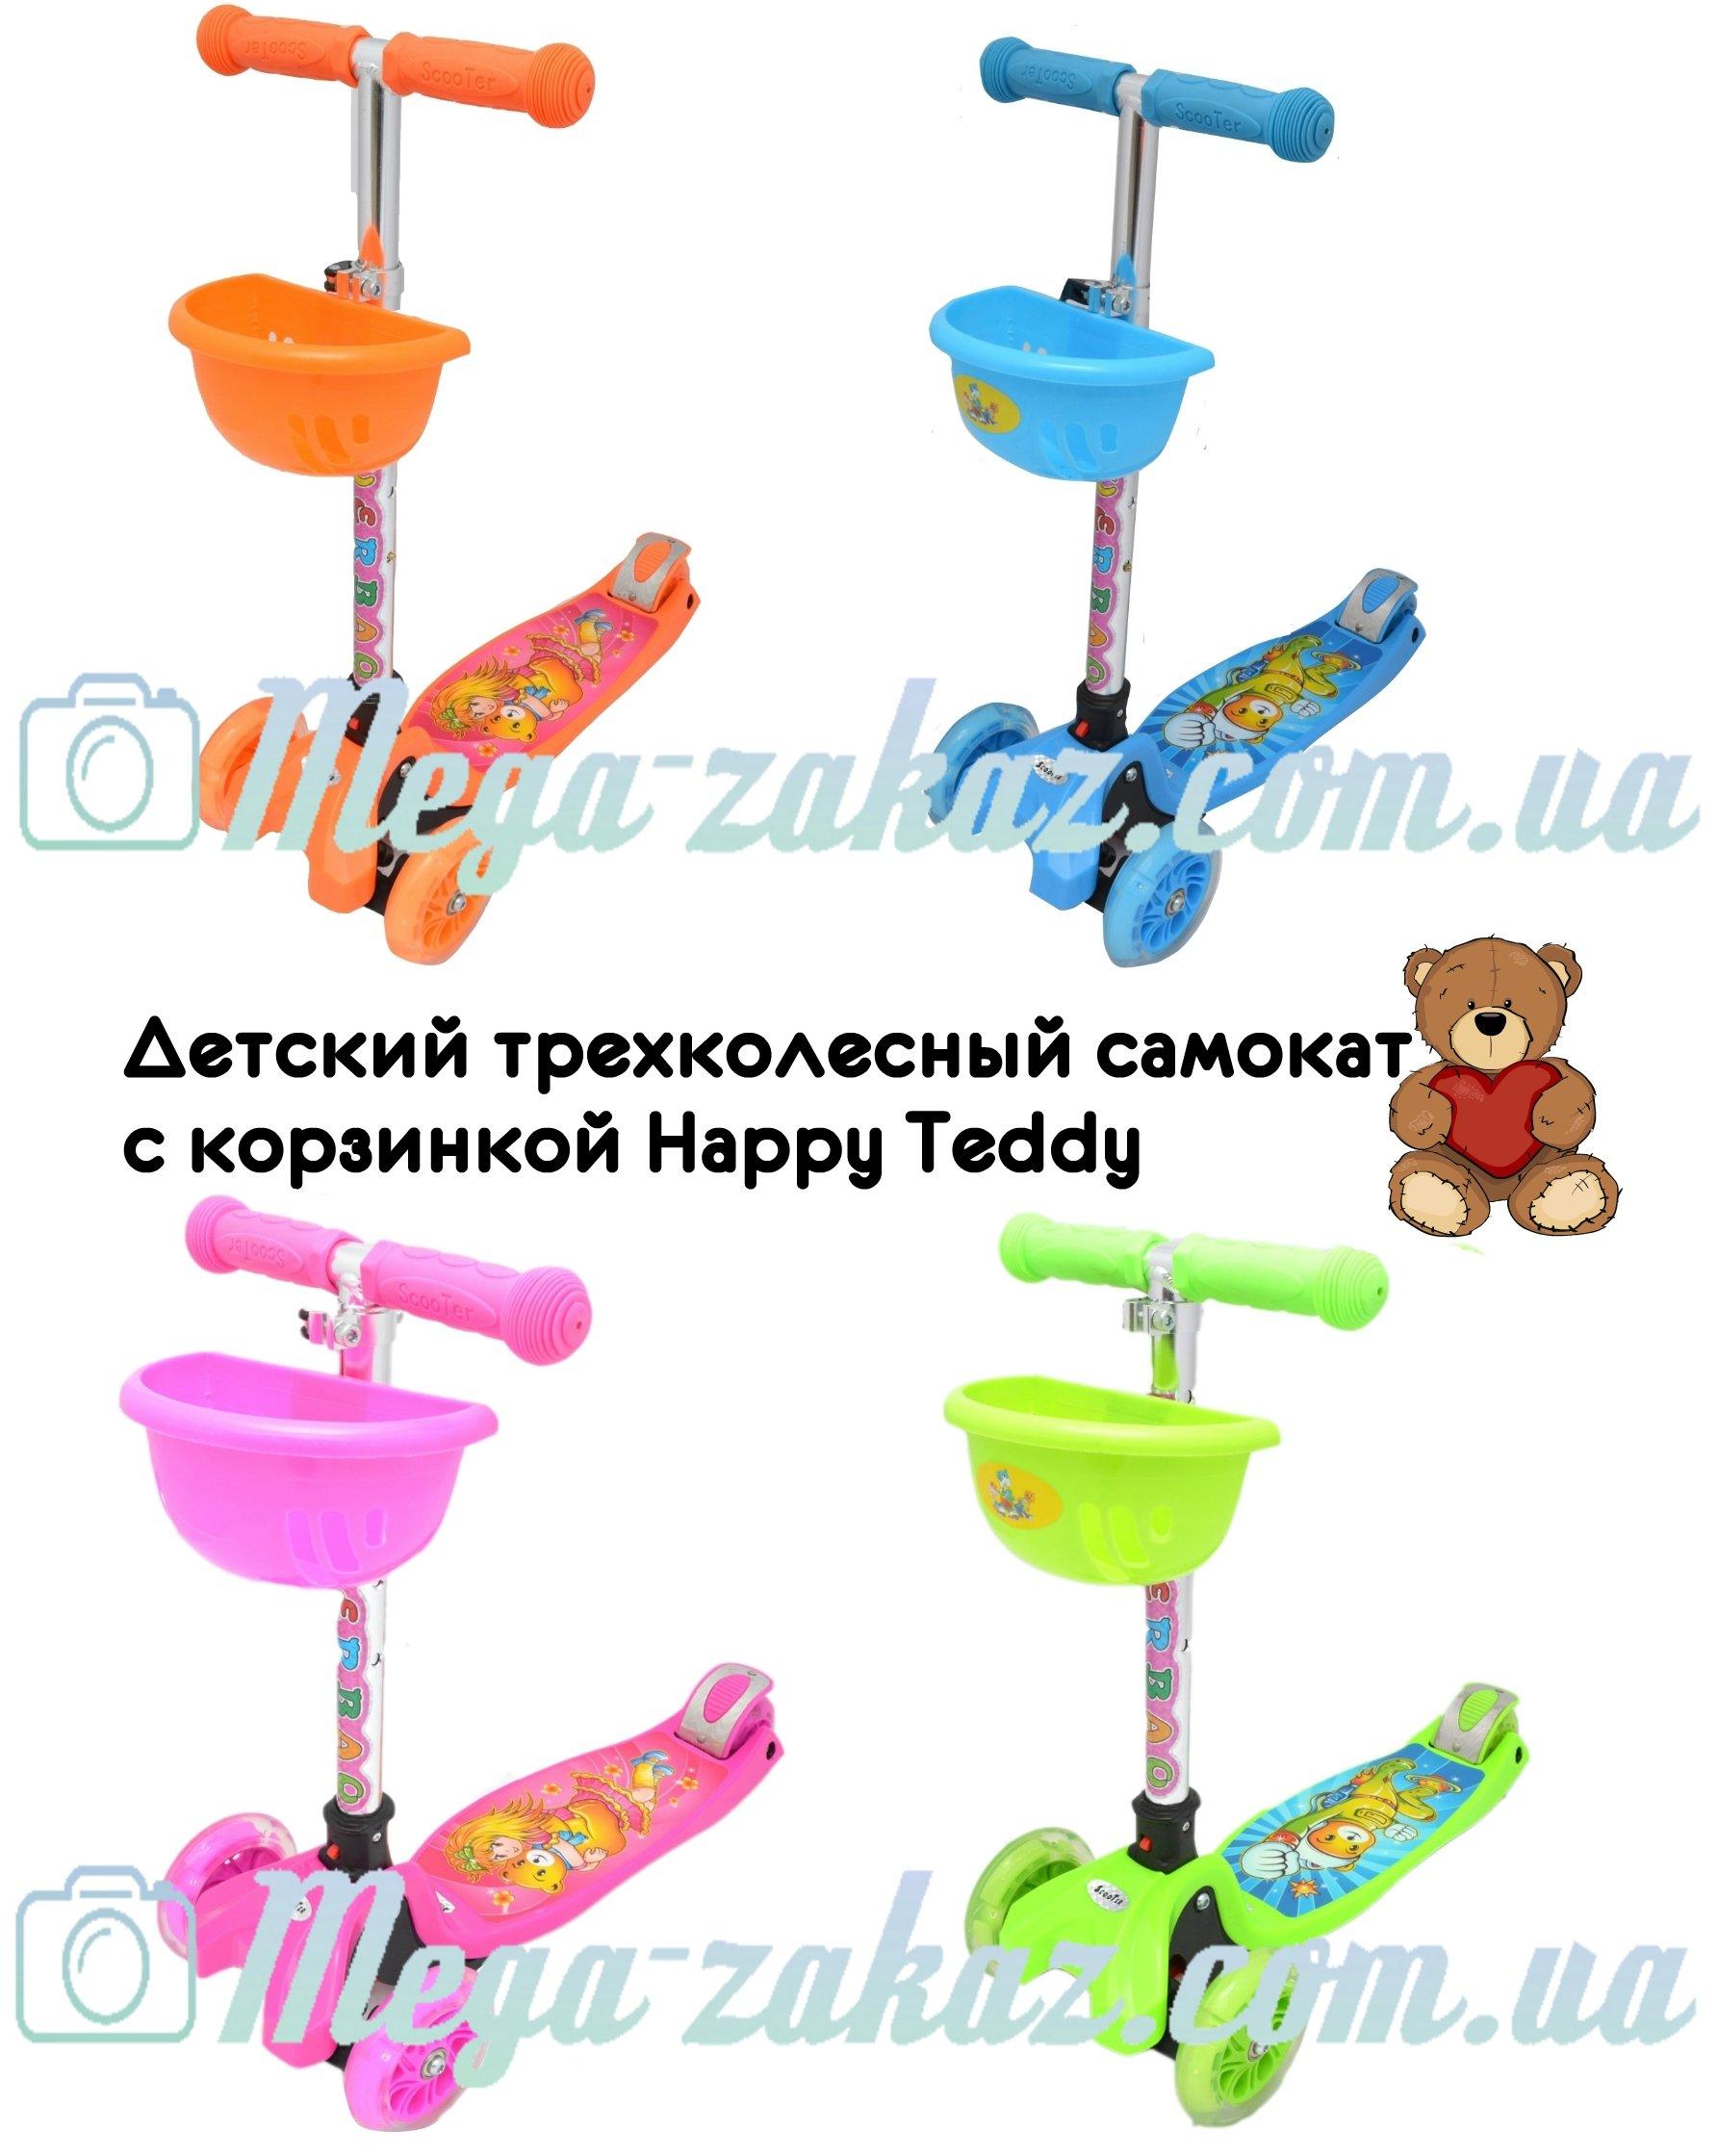 https://mega-zakaz.com.ua/images/upload/самокат%20039ZAKAZ.jpg